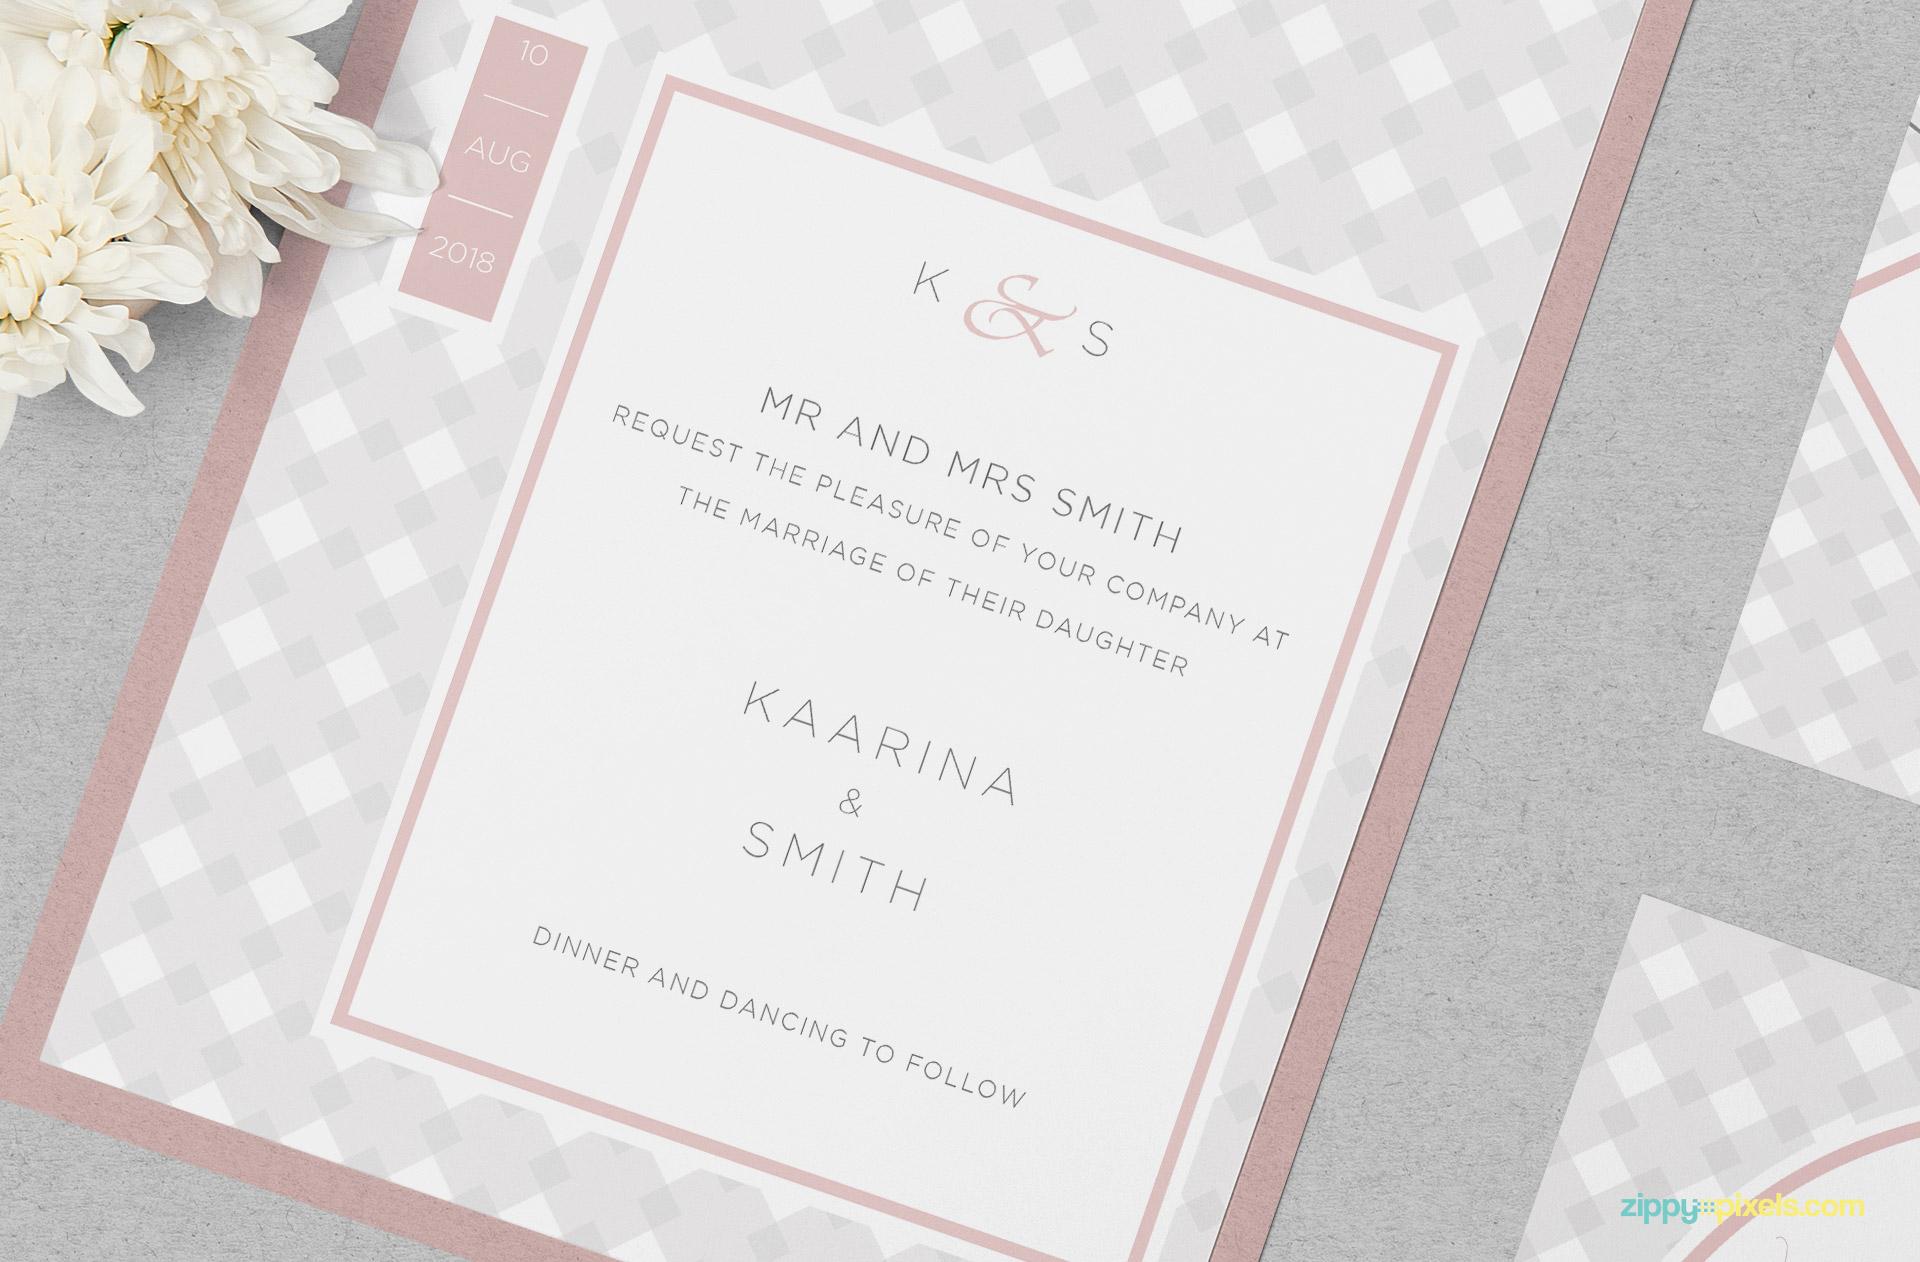 Beautiful wedding invitation card mockup.